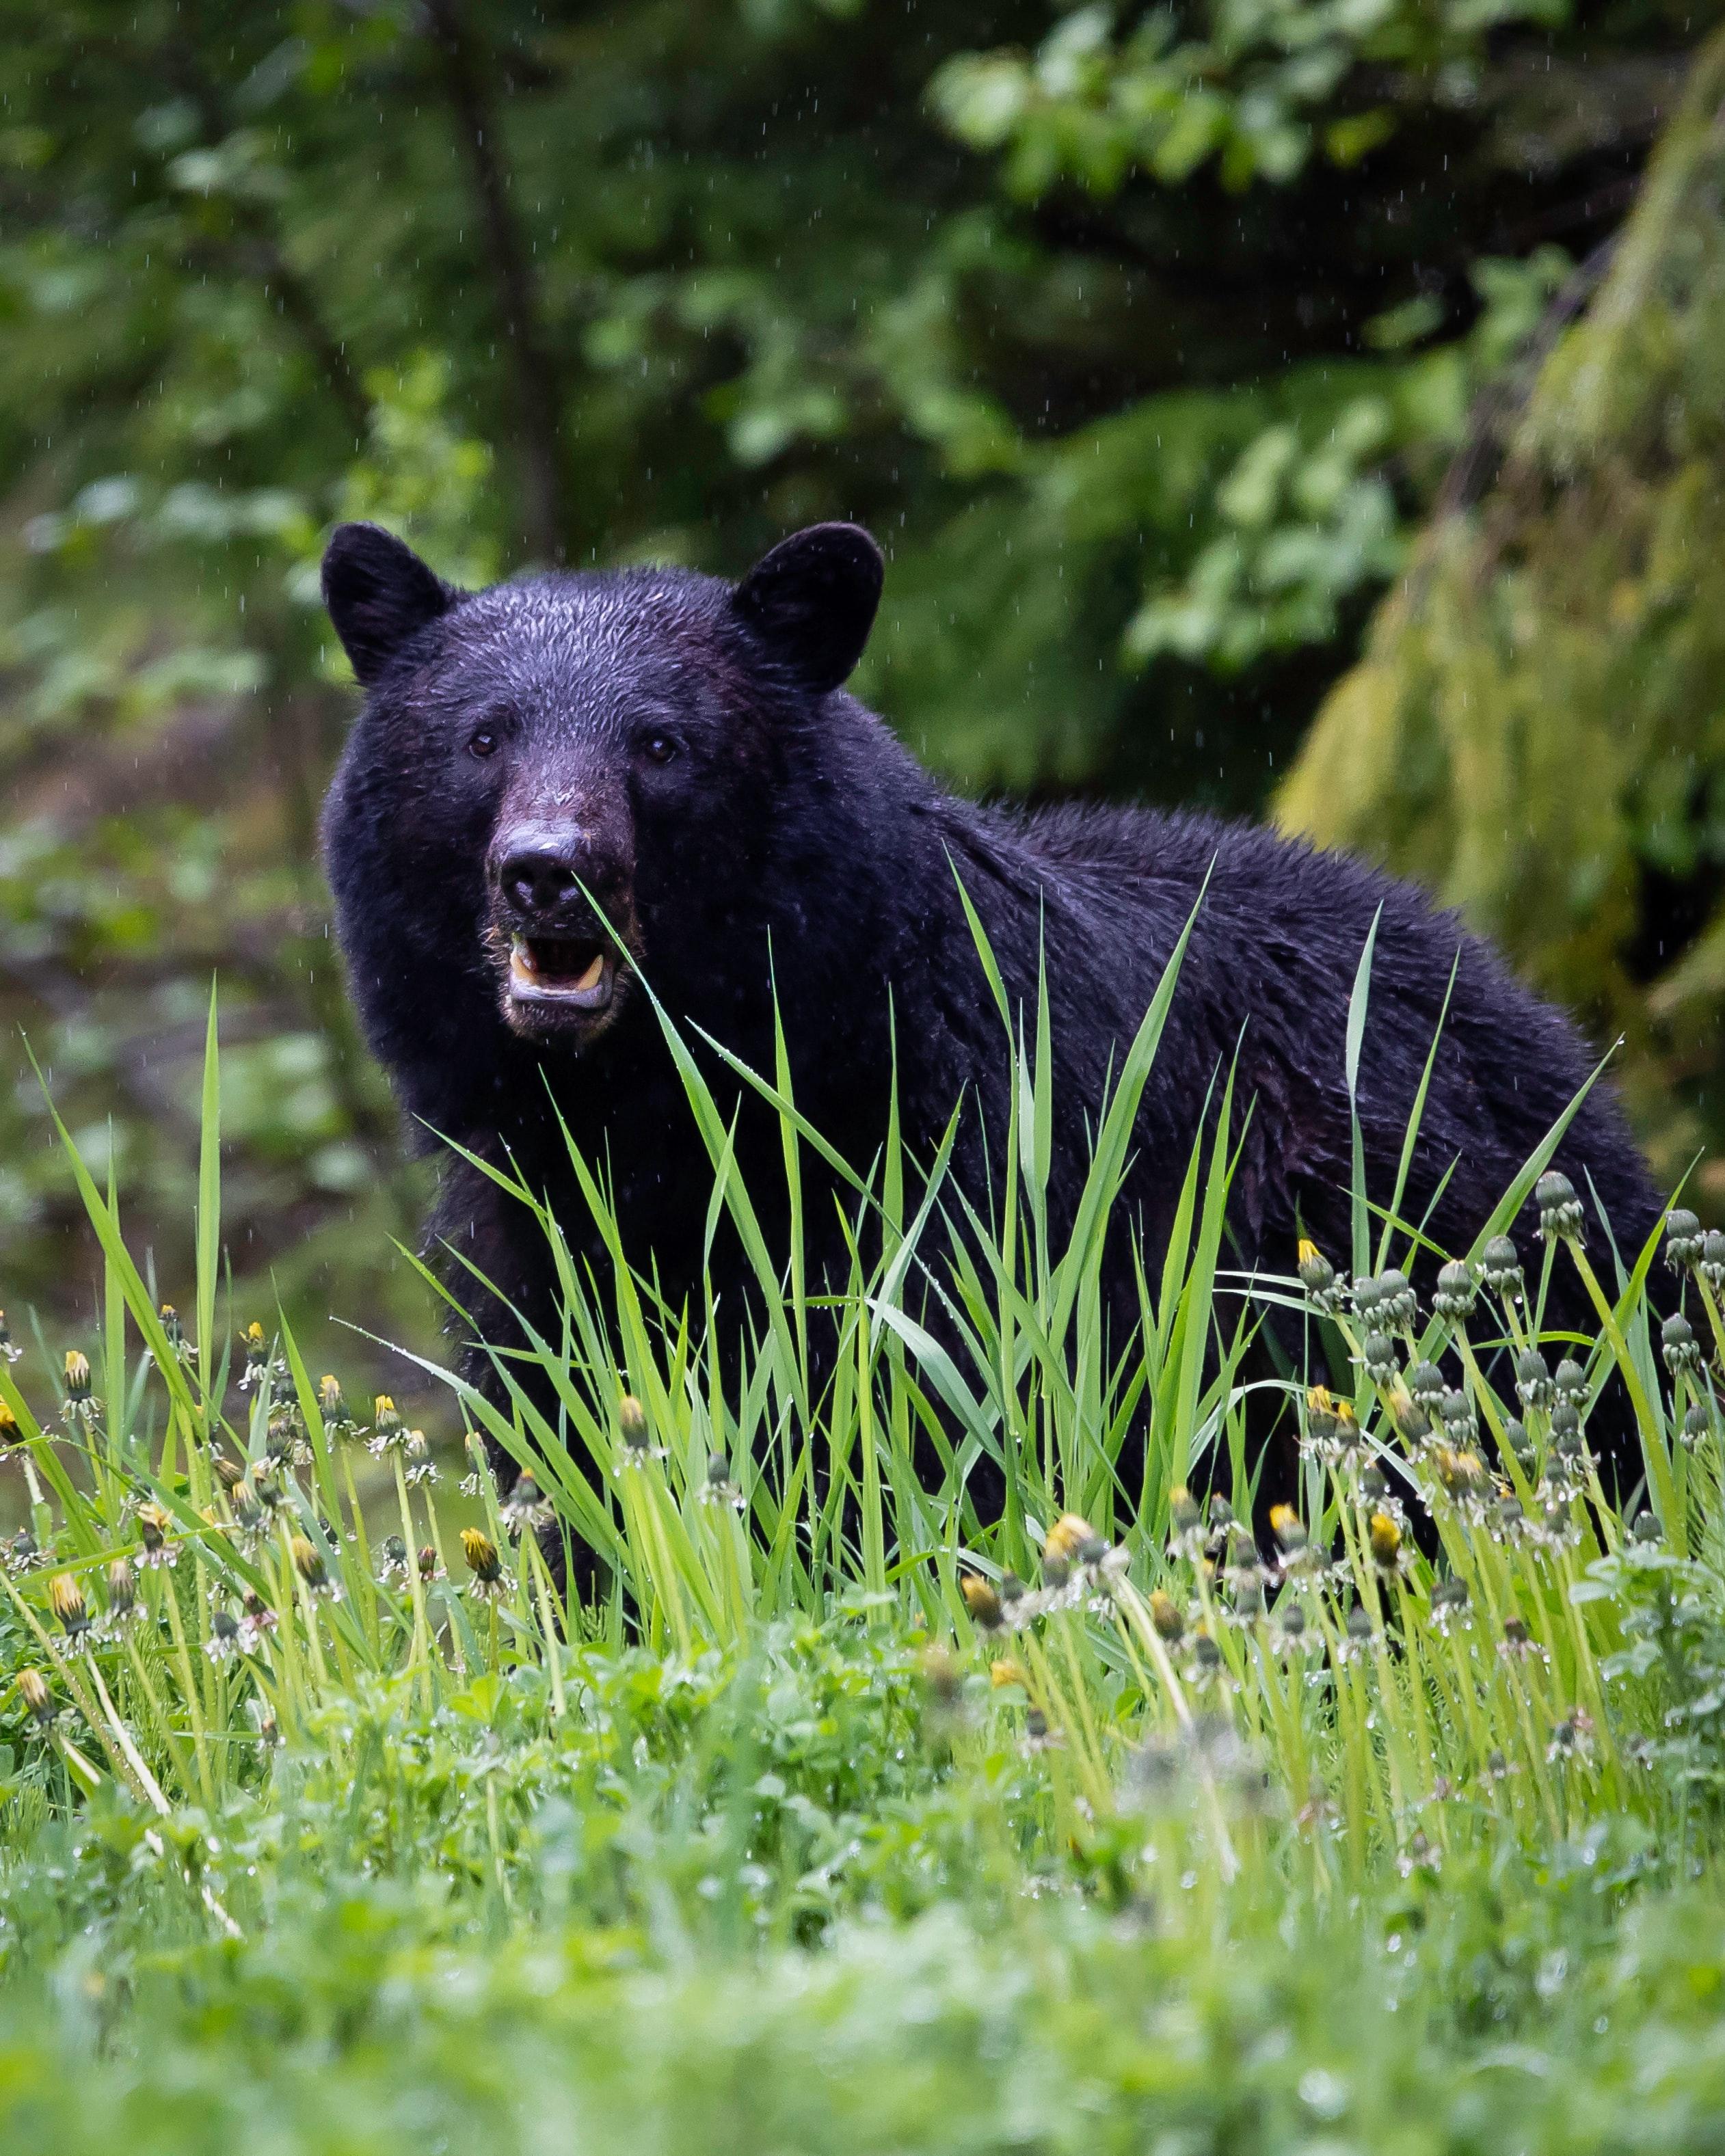 Black_Bear_22.jpeg